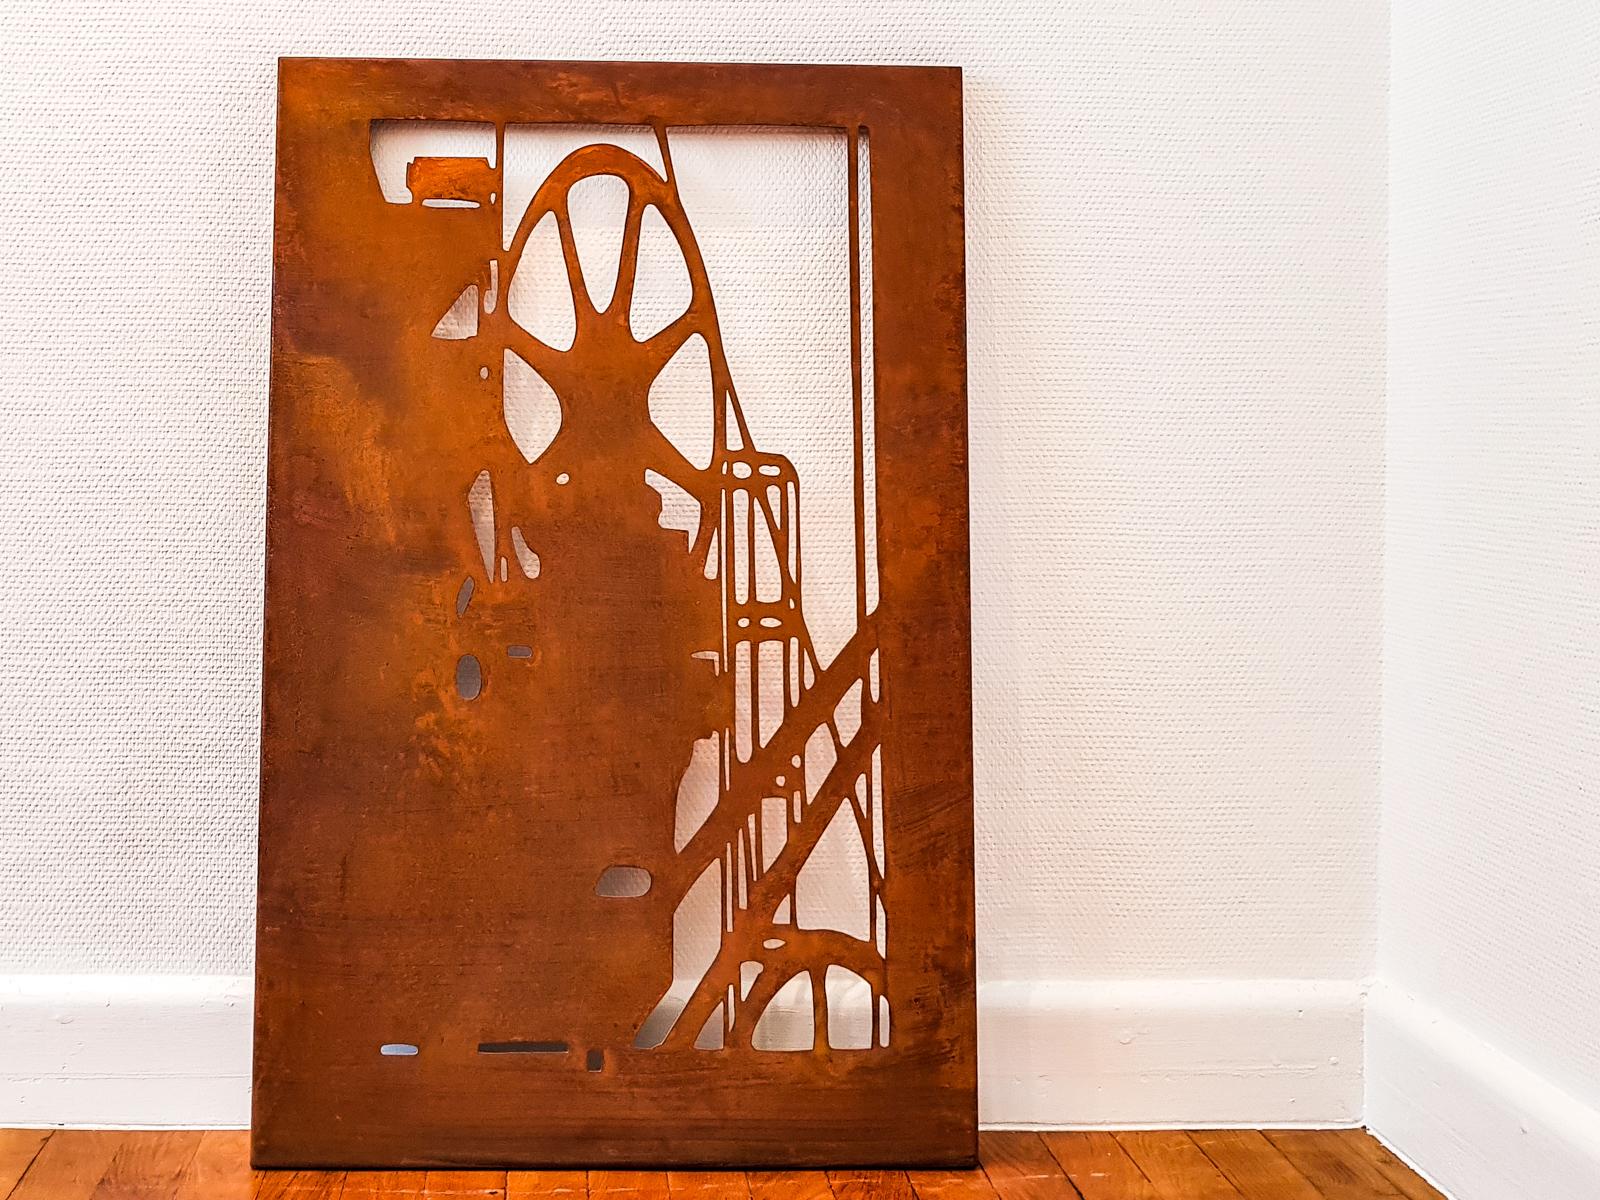 Shadows of industrial past 1 - Metal Plate60 x 90 cmEUR 4.500